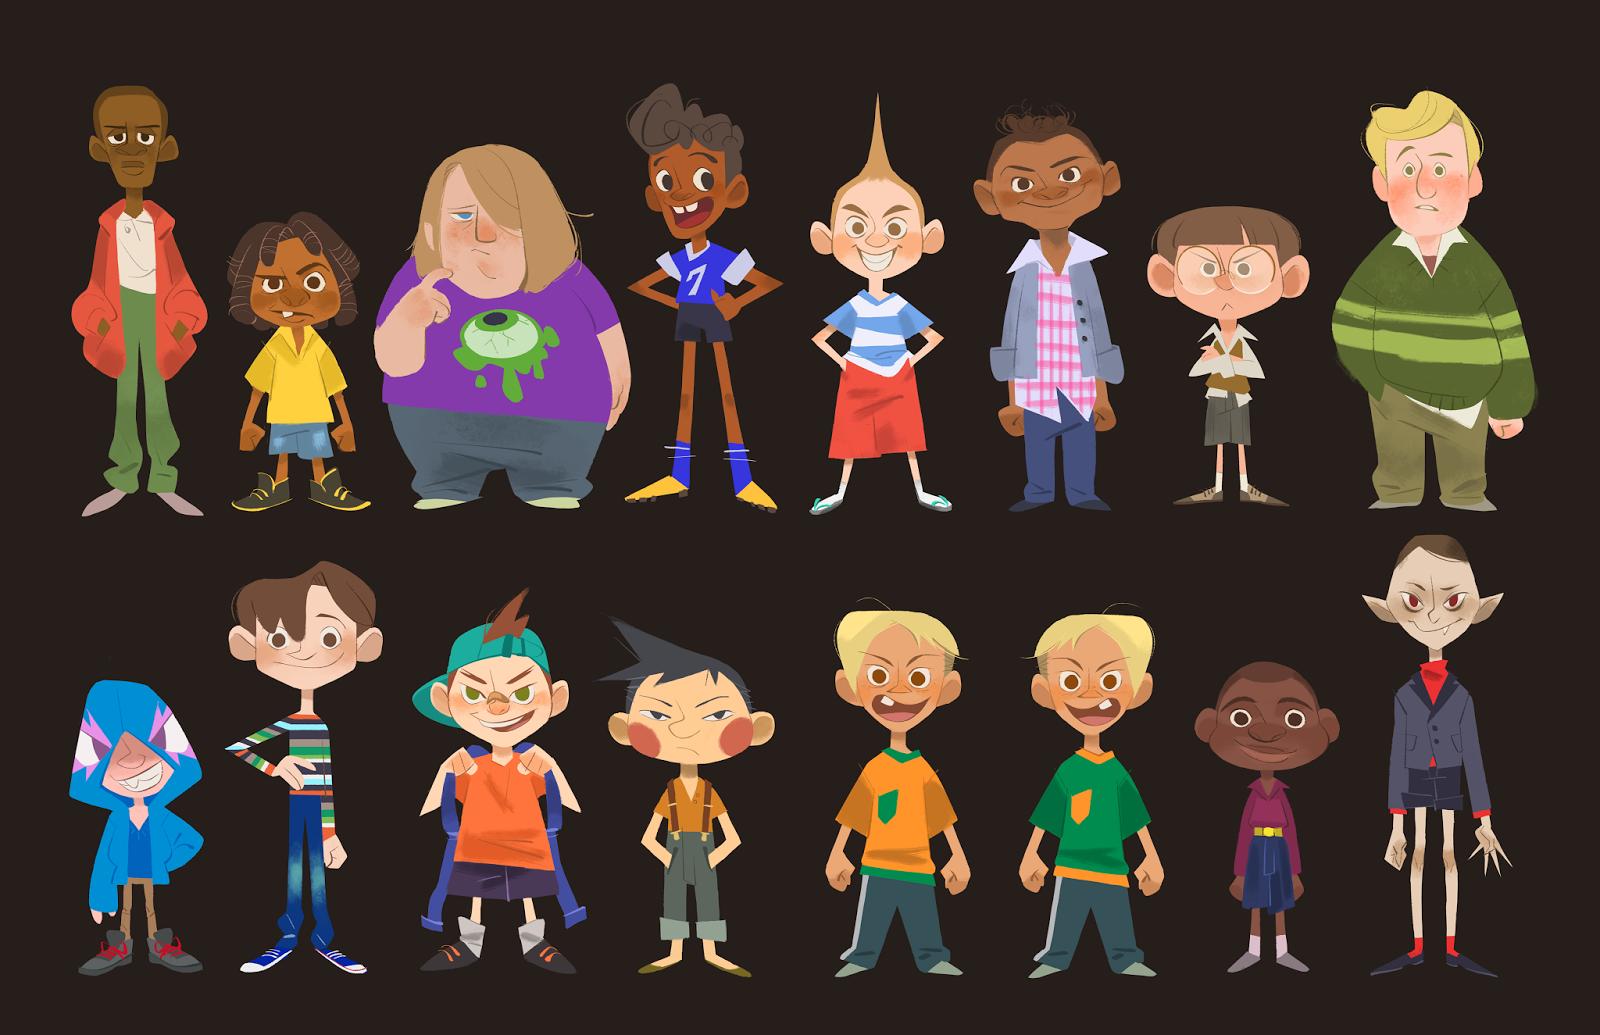 Calarts Character Design Portfolio : Soyeon yoo s portfolio